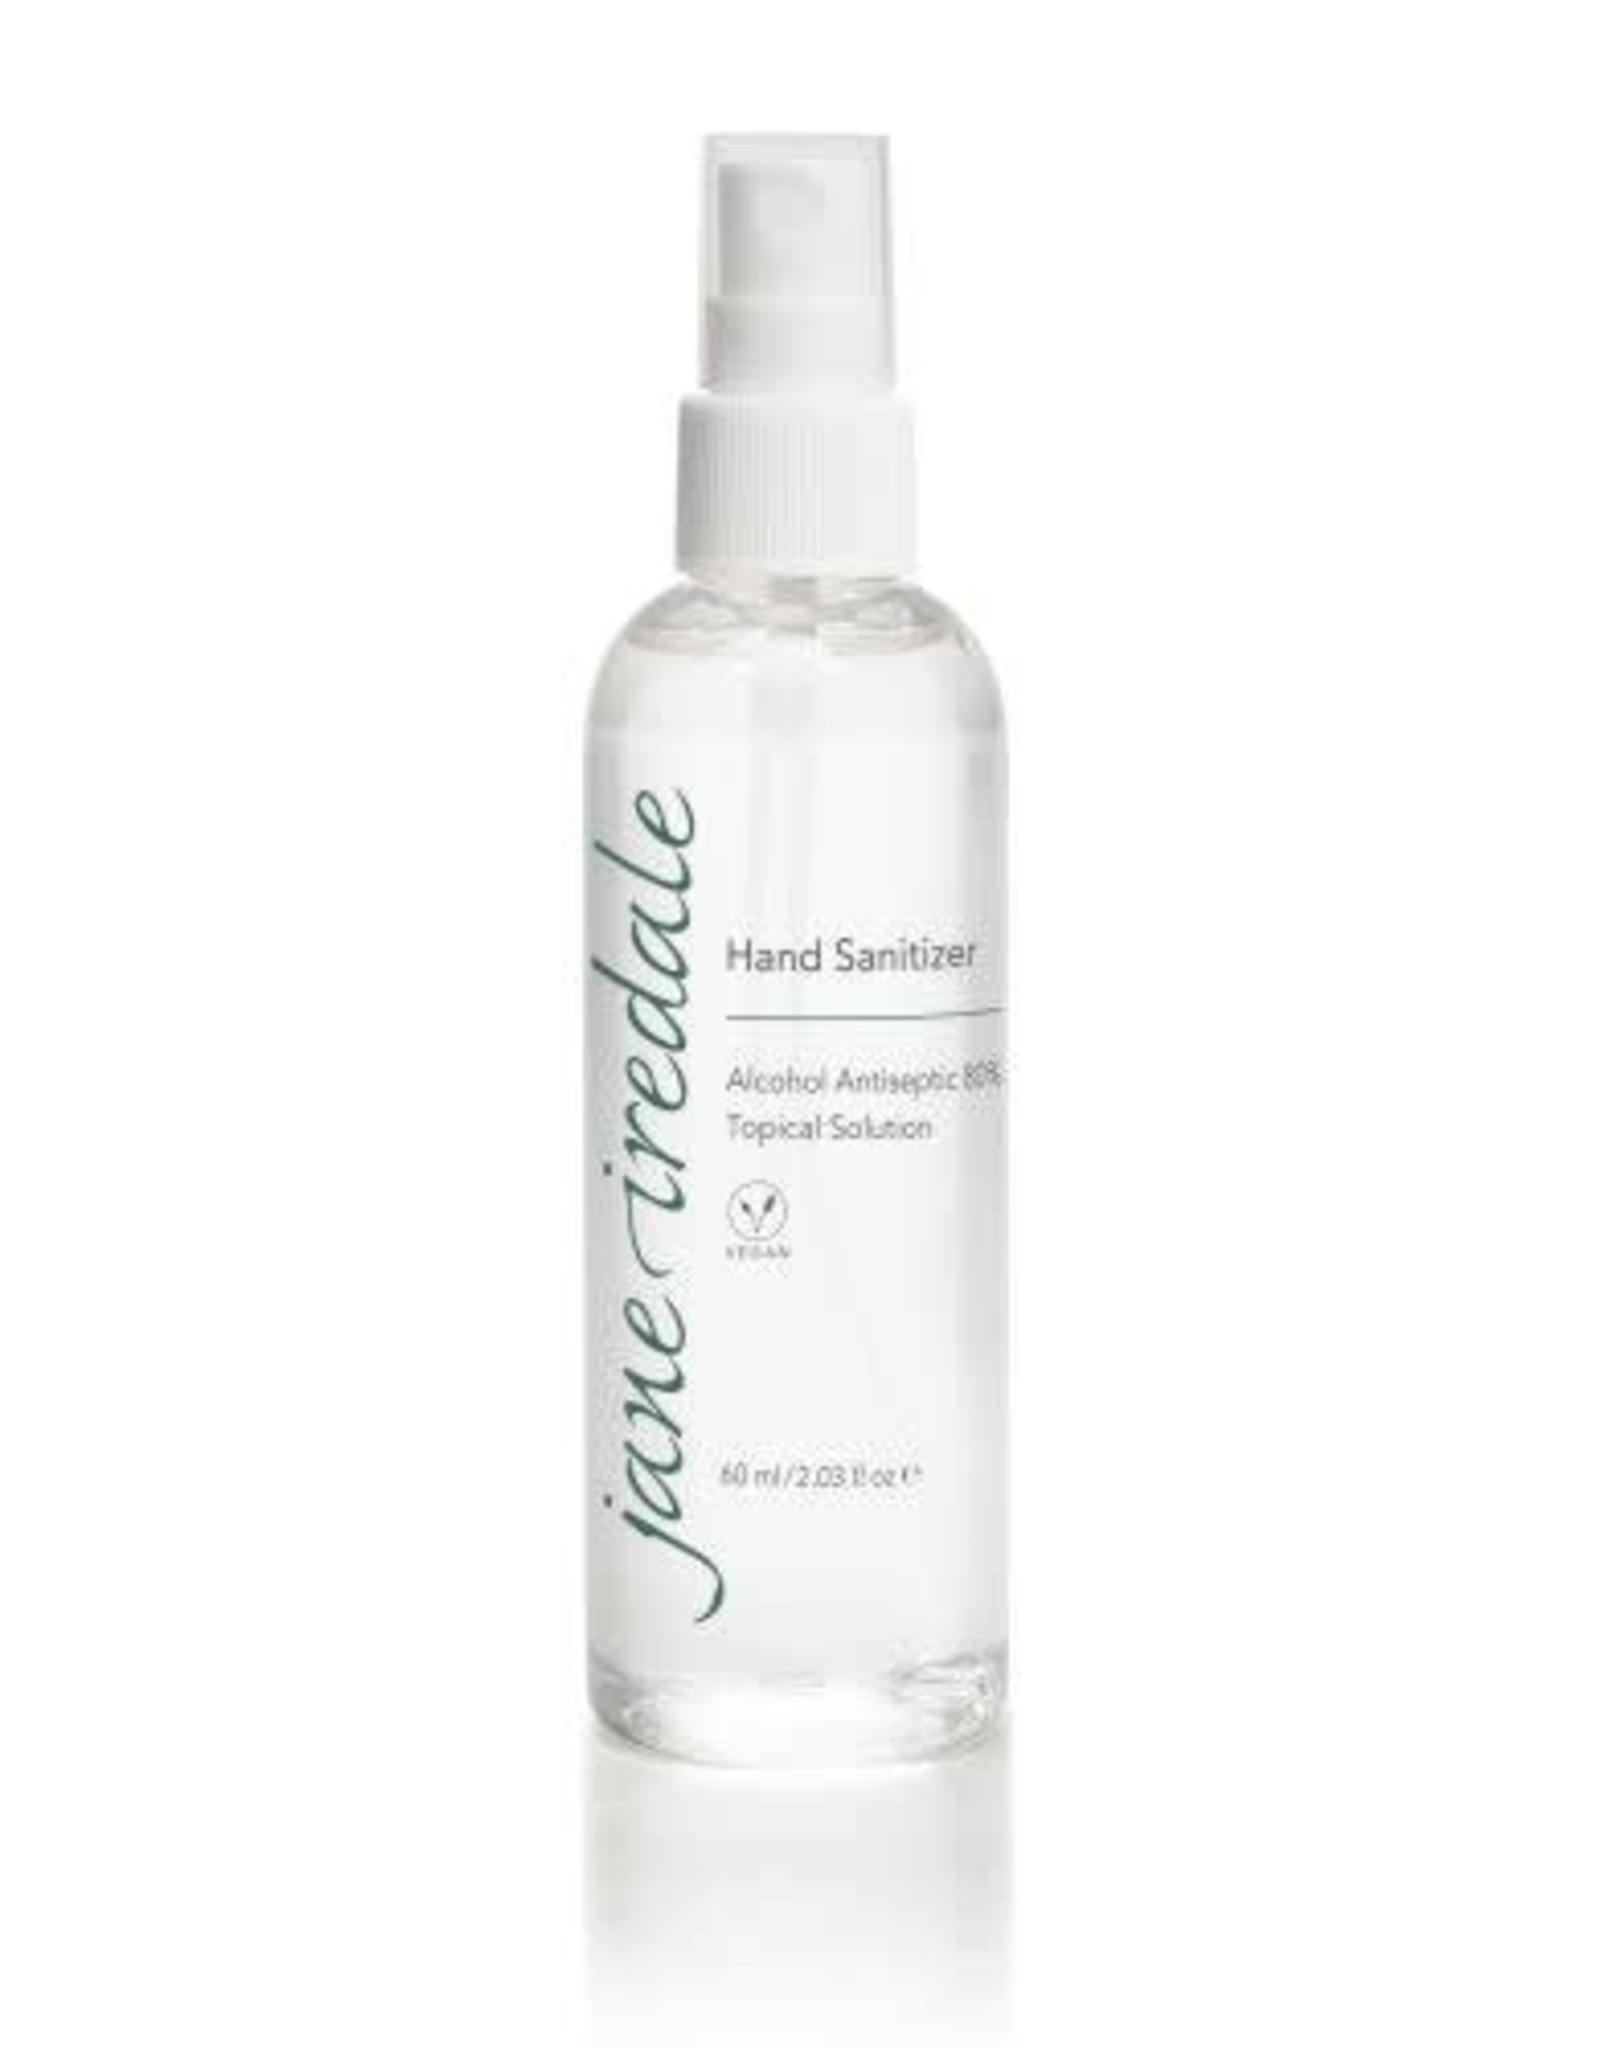 Jane Iredale Hand Sanitizer (80% Alcohol)